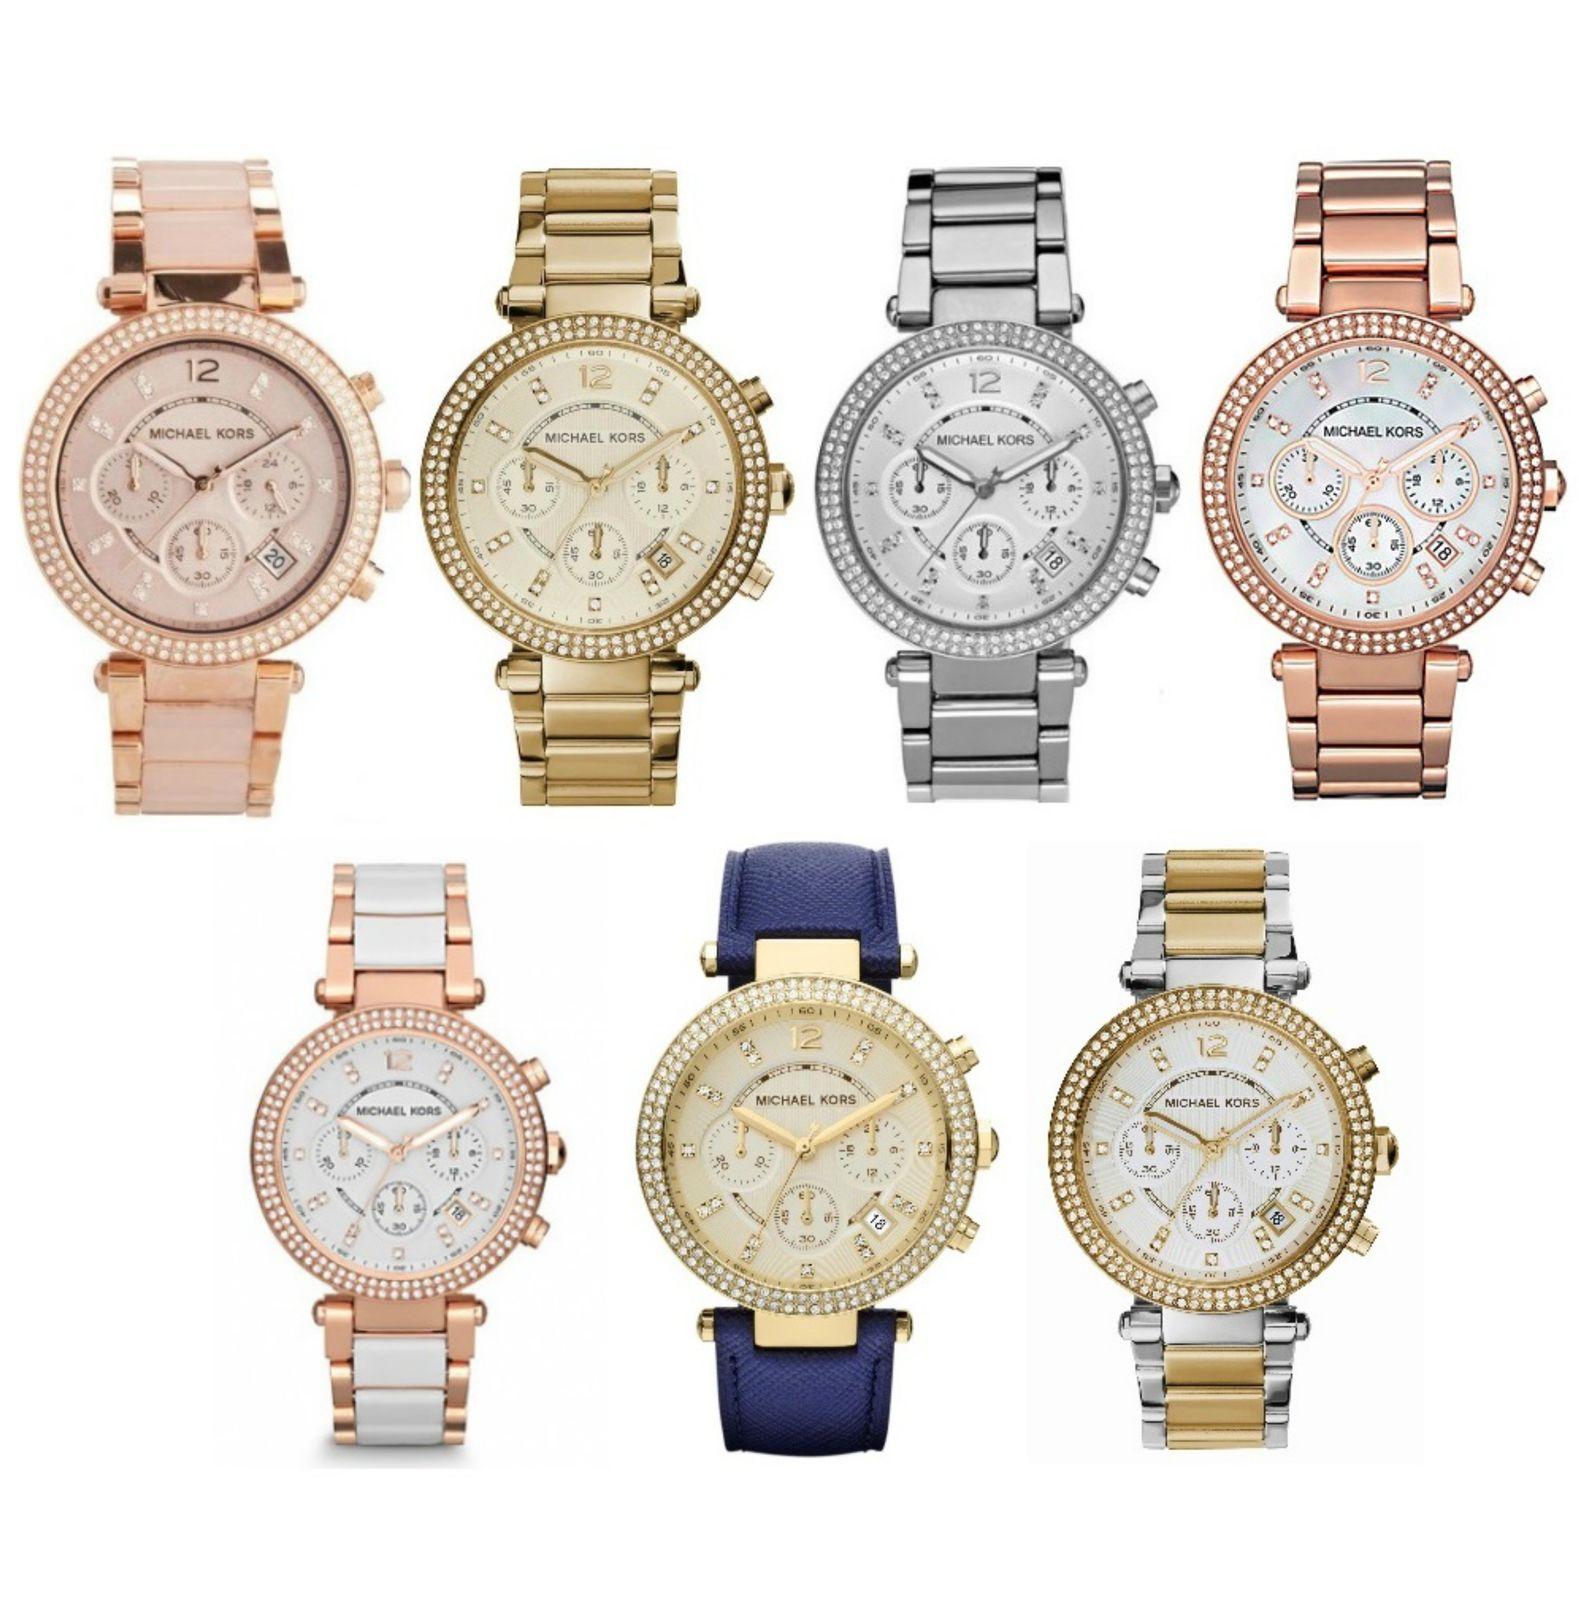 Michael Kors Ladies' Parker Stainless Steel Chronograph Diamond Designer Watches